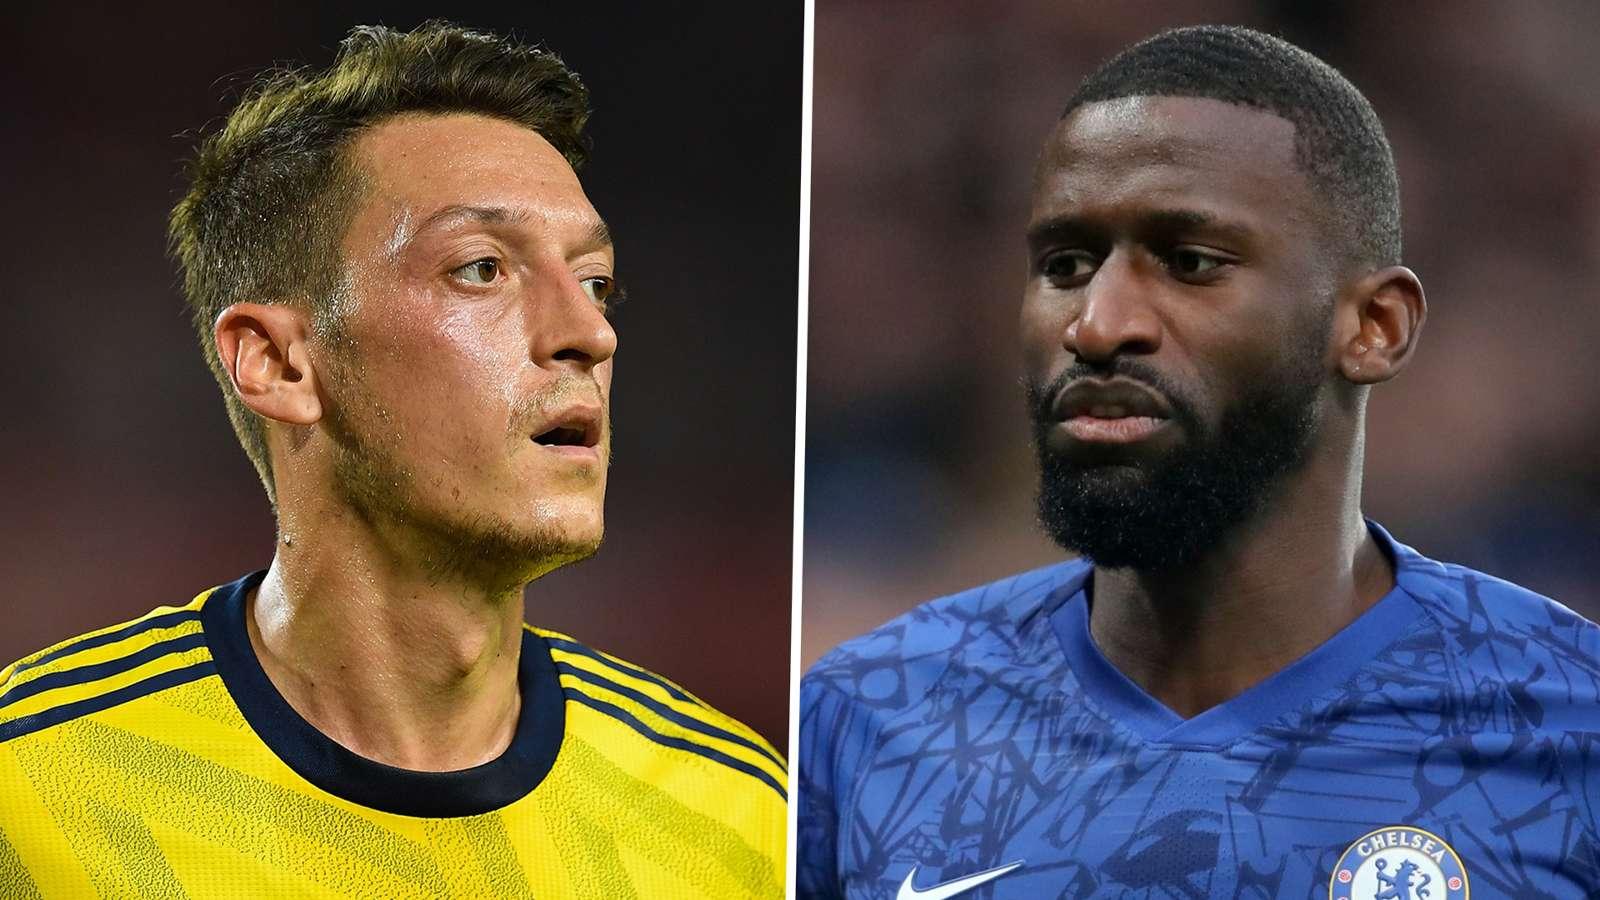 آرسنال-چلسی-لیگ برتر-توپچیها-آلمان-Germany-England-Premier League-Arsenal-Chelsea